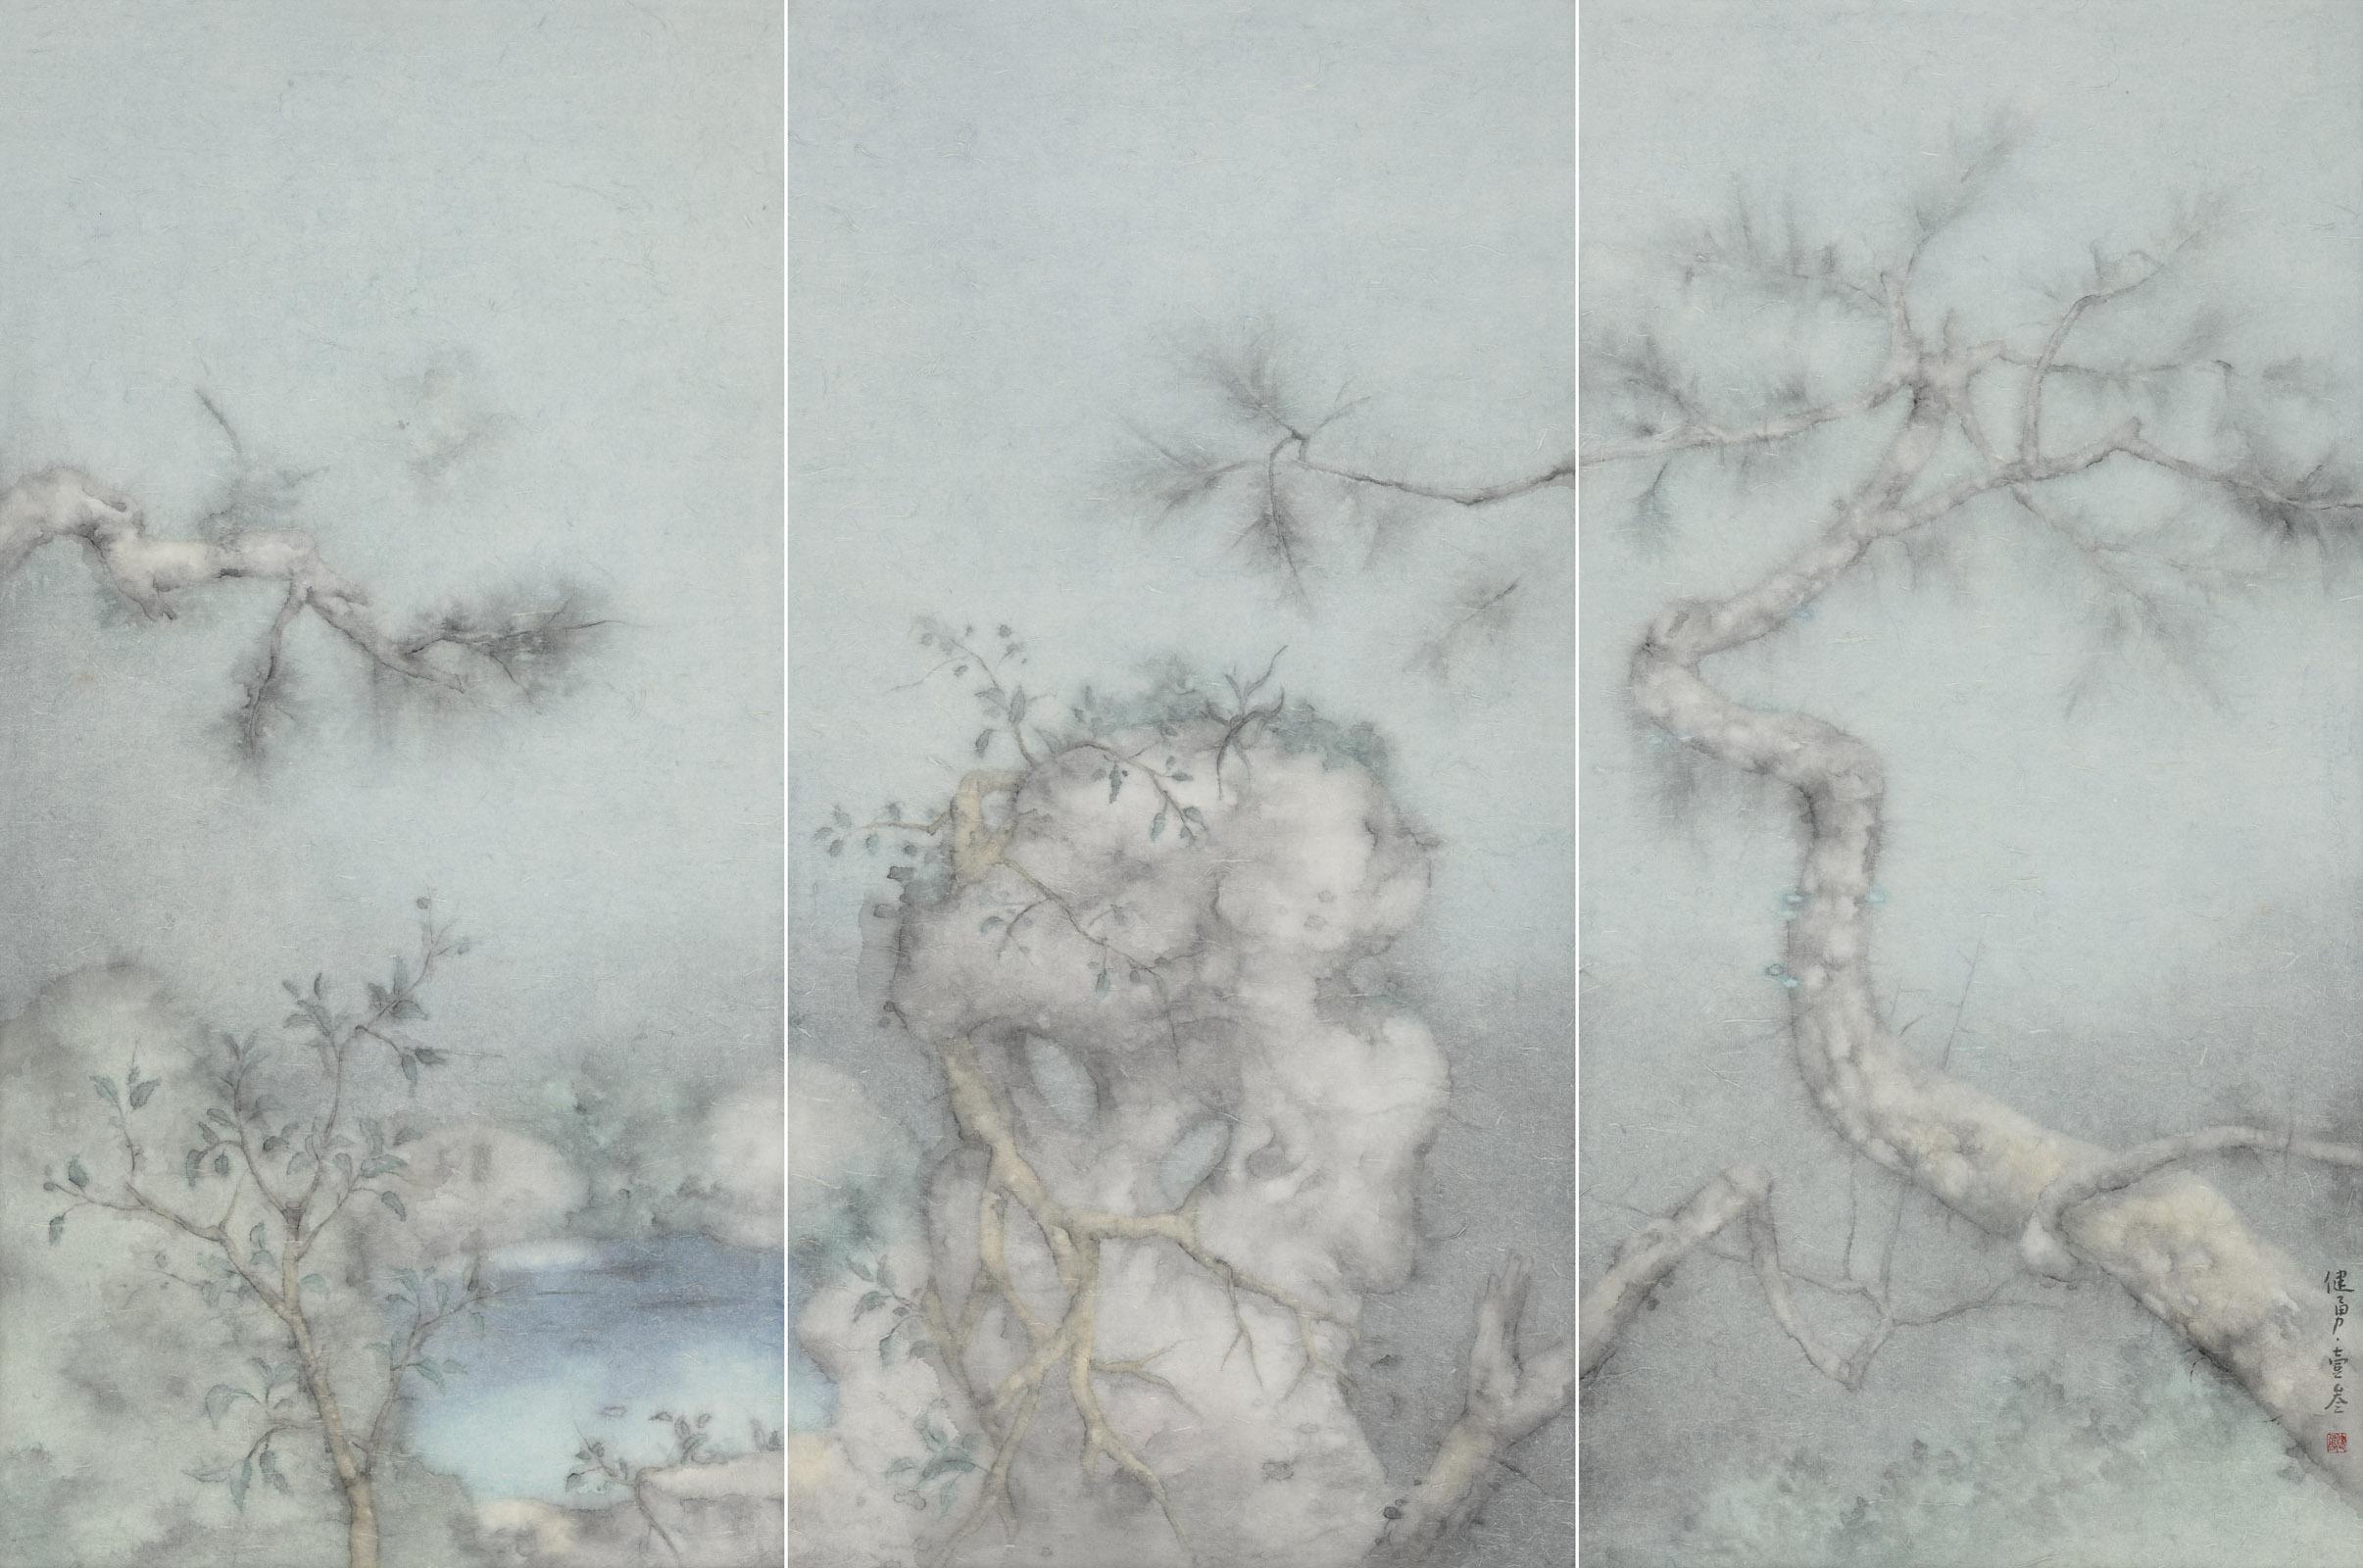 Zeng Jianyong 曾健勇, Specimen of the Hometown Garden No.1 故园标本之一, 2013, 144 x 72 cm x 3